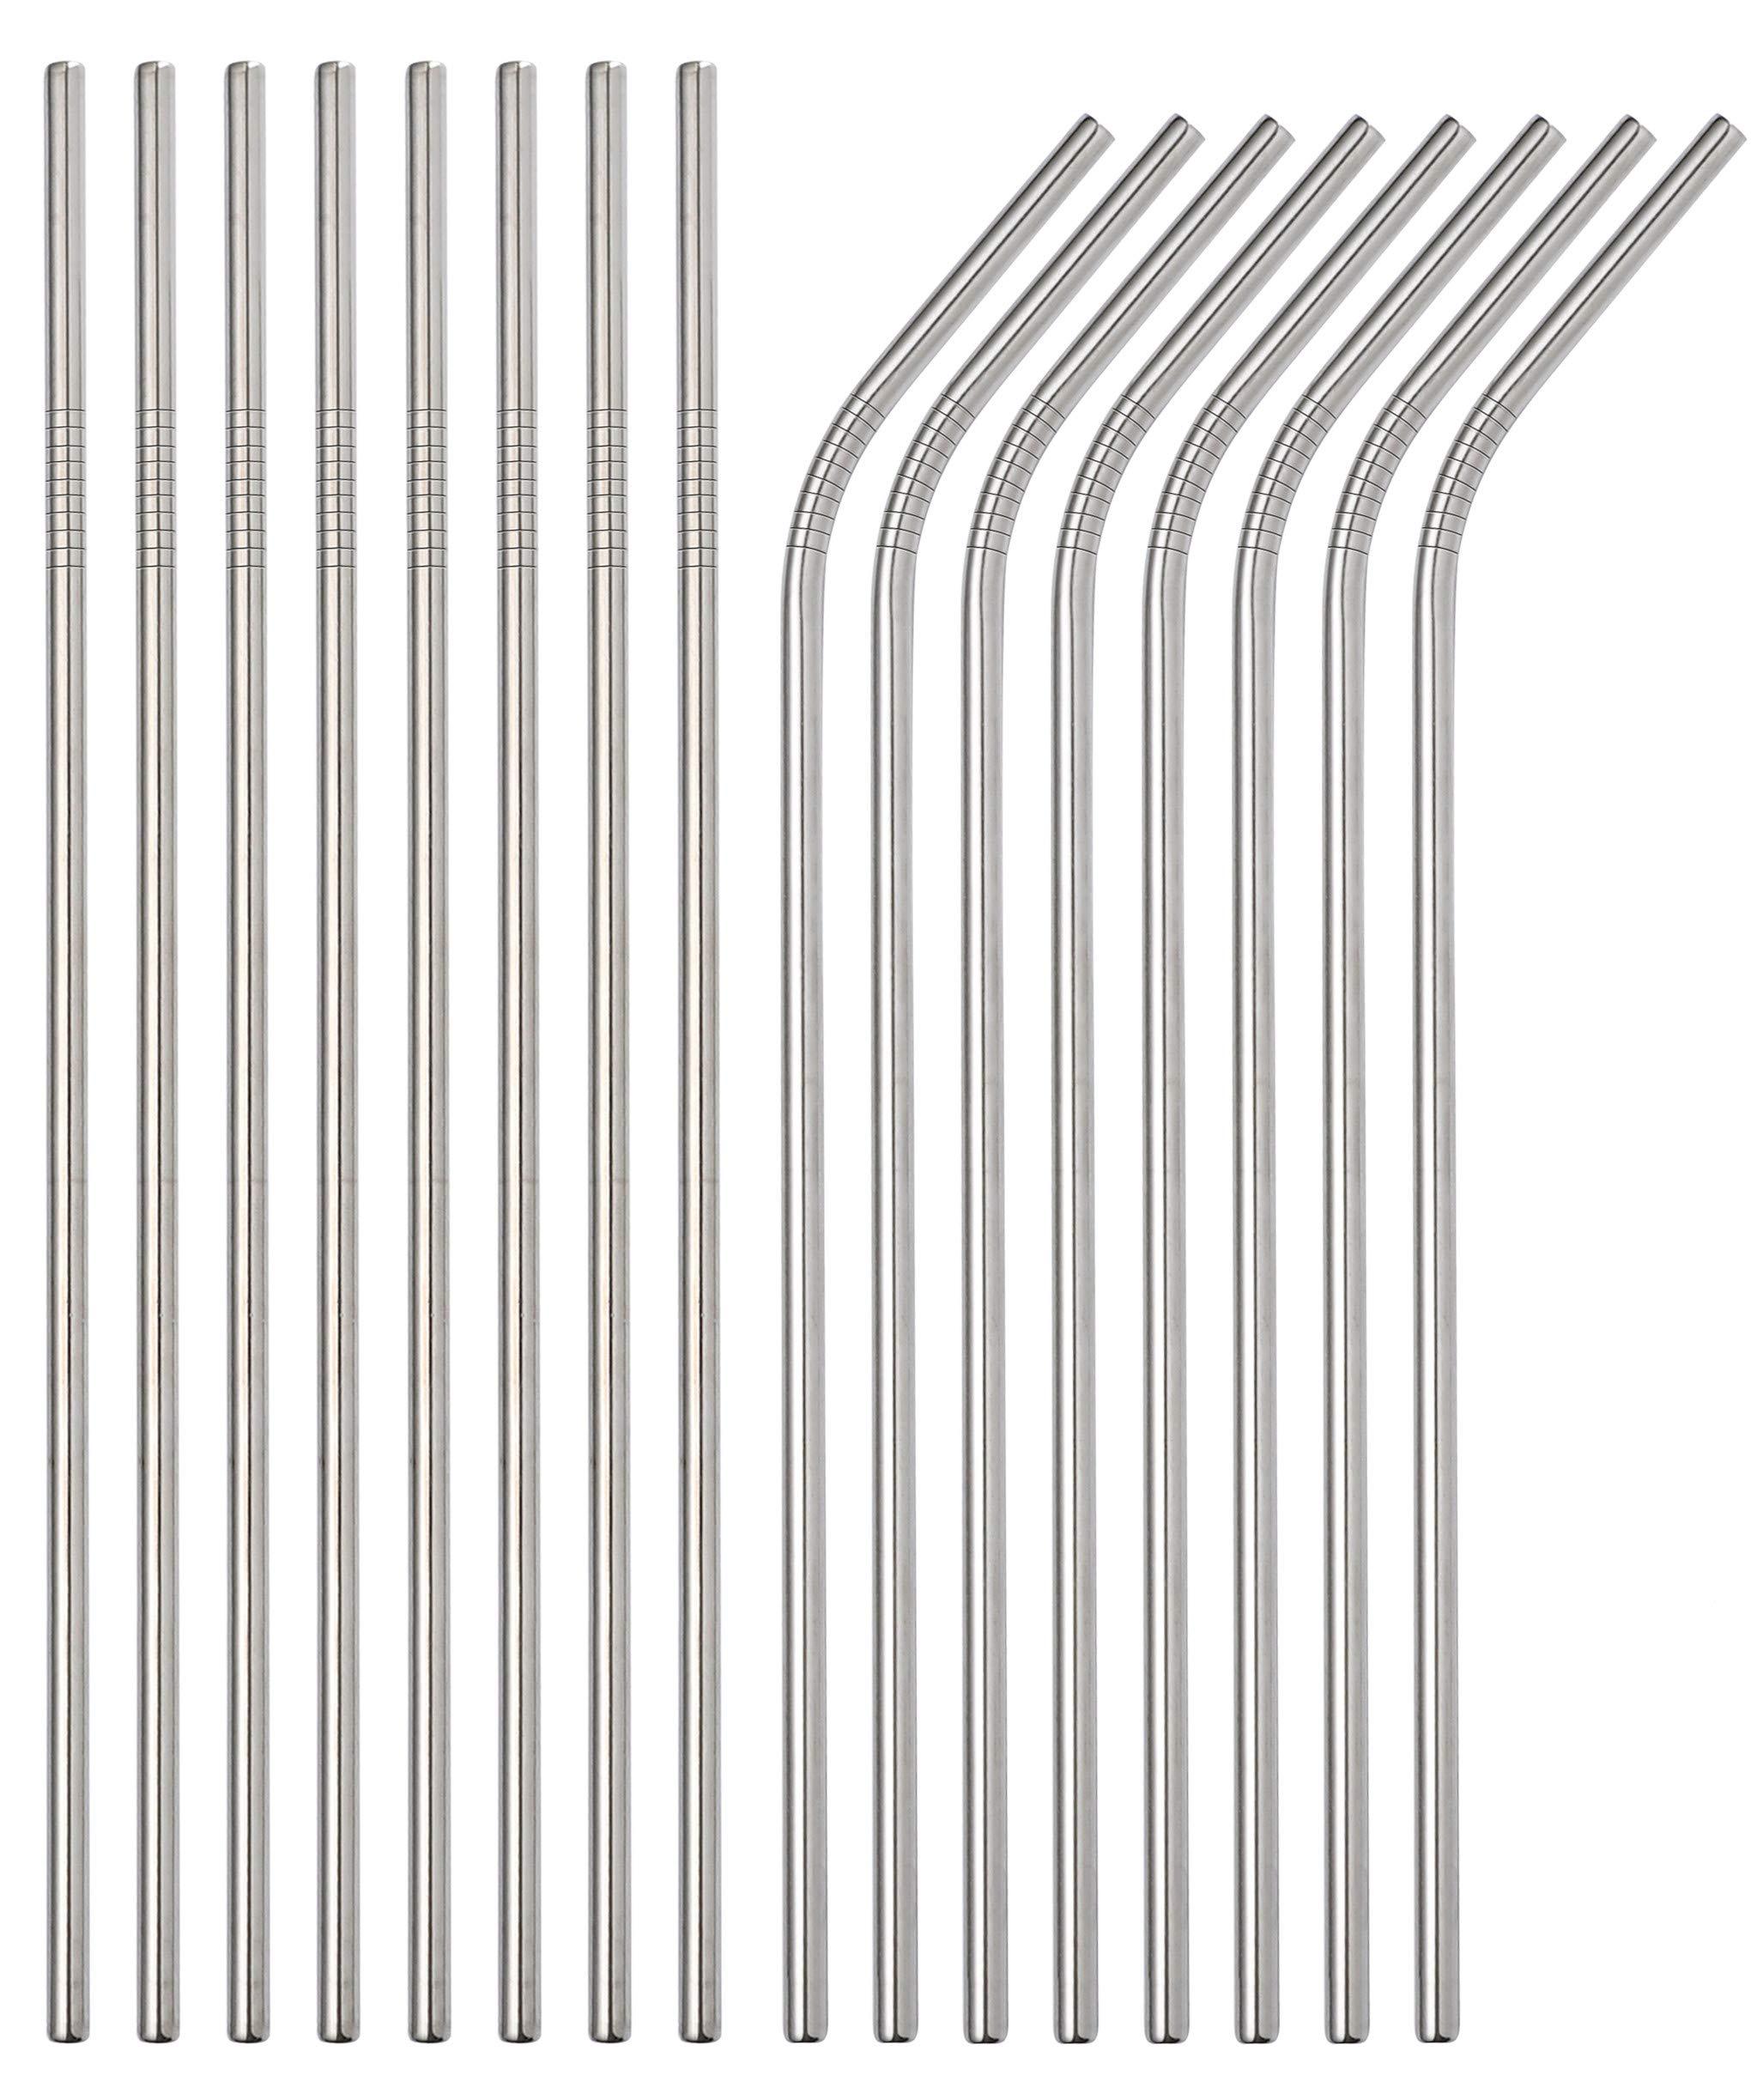 Sunwinc Stainless Steel Straws, 400 Pcs Reusable Metal Straws.For Tumblers Yeti Cups Travel Mugs,Reusable Rustproof Eco-Friendly Dishwasher by Sunwinc (Image #1)